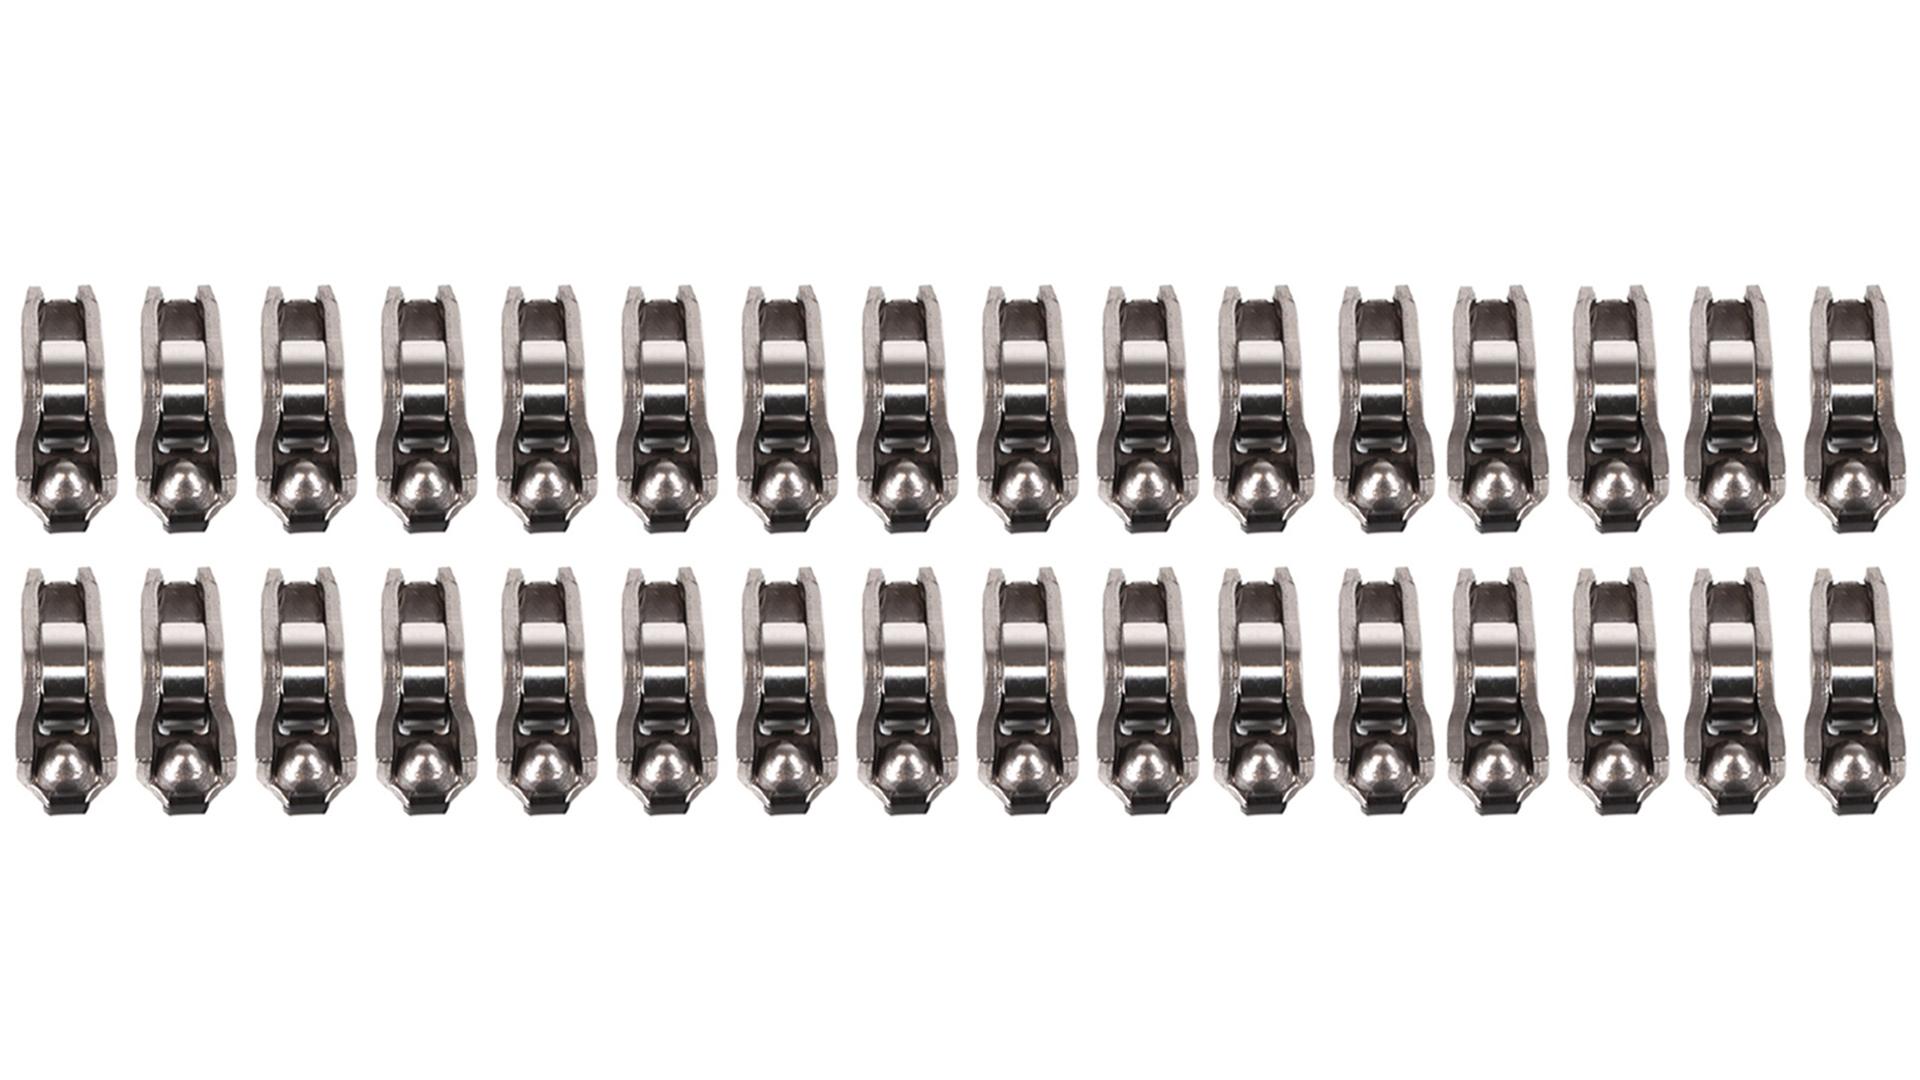 32x Levier de bascule levier oscillant Audi A6 RS6 A7 RS7 A8 4,0 TFSI CWUB agences de la banque crdb CGTA Nouveau